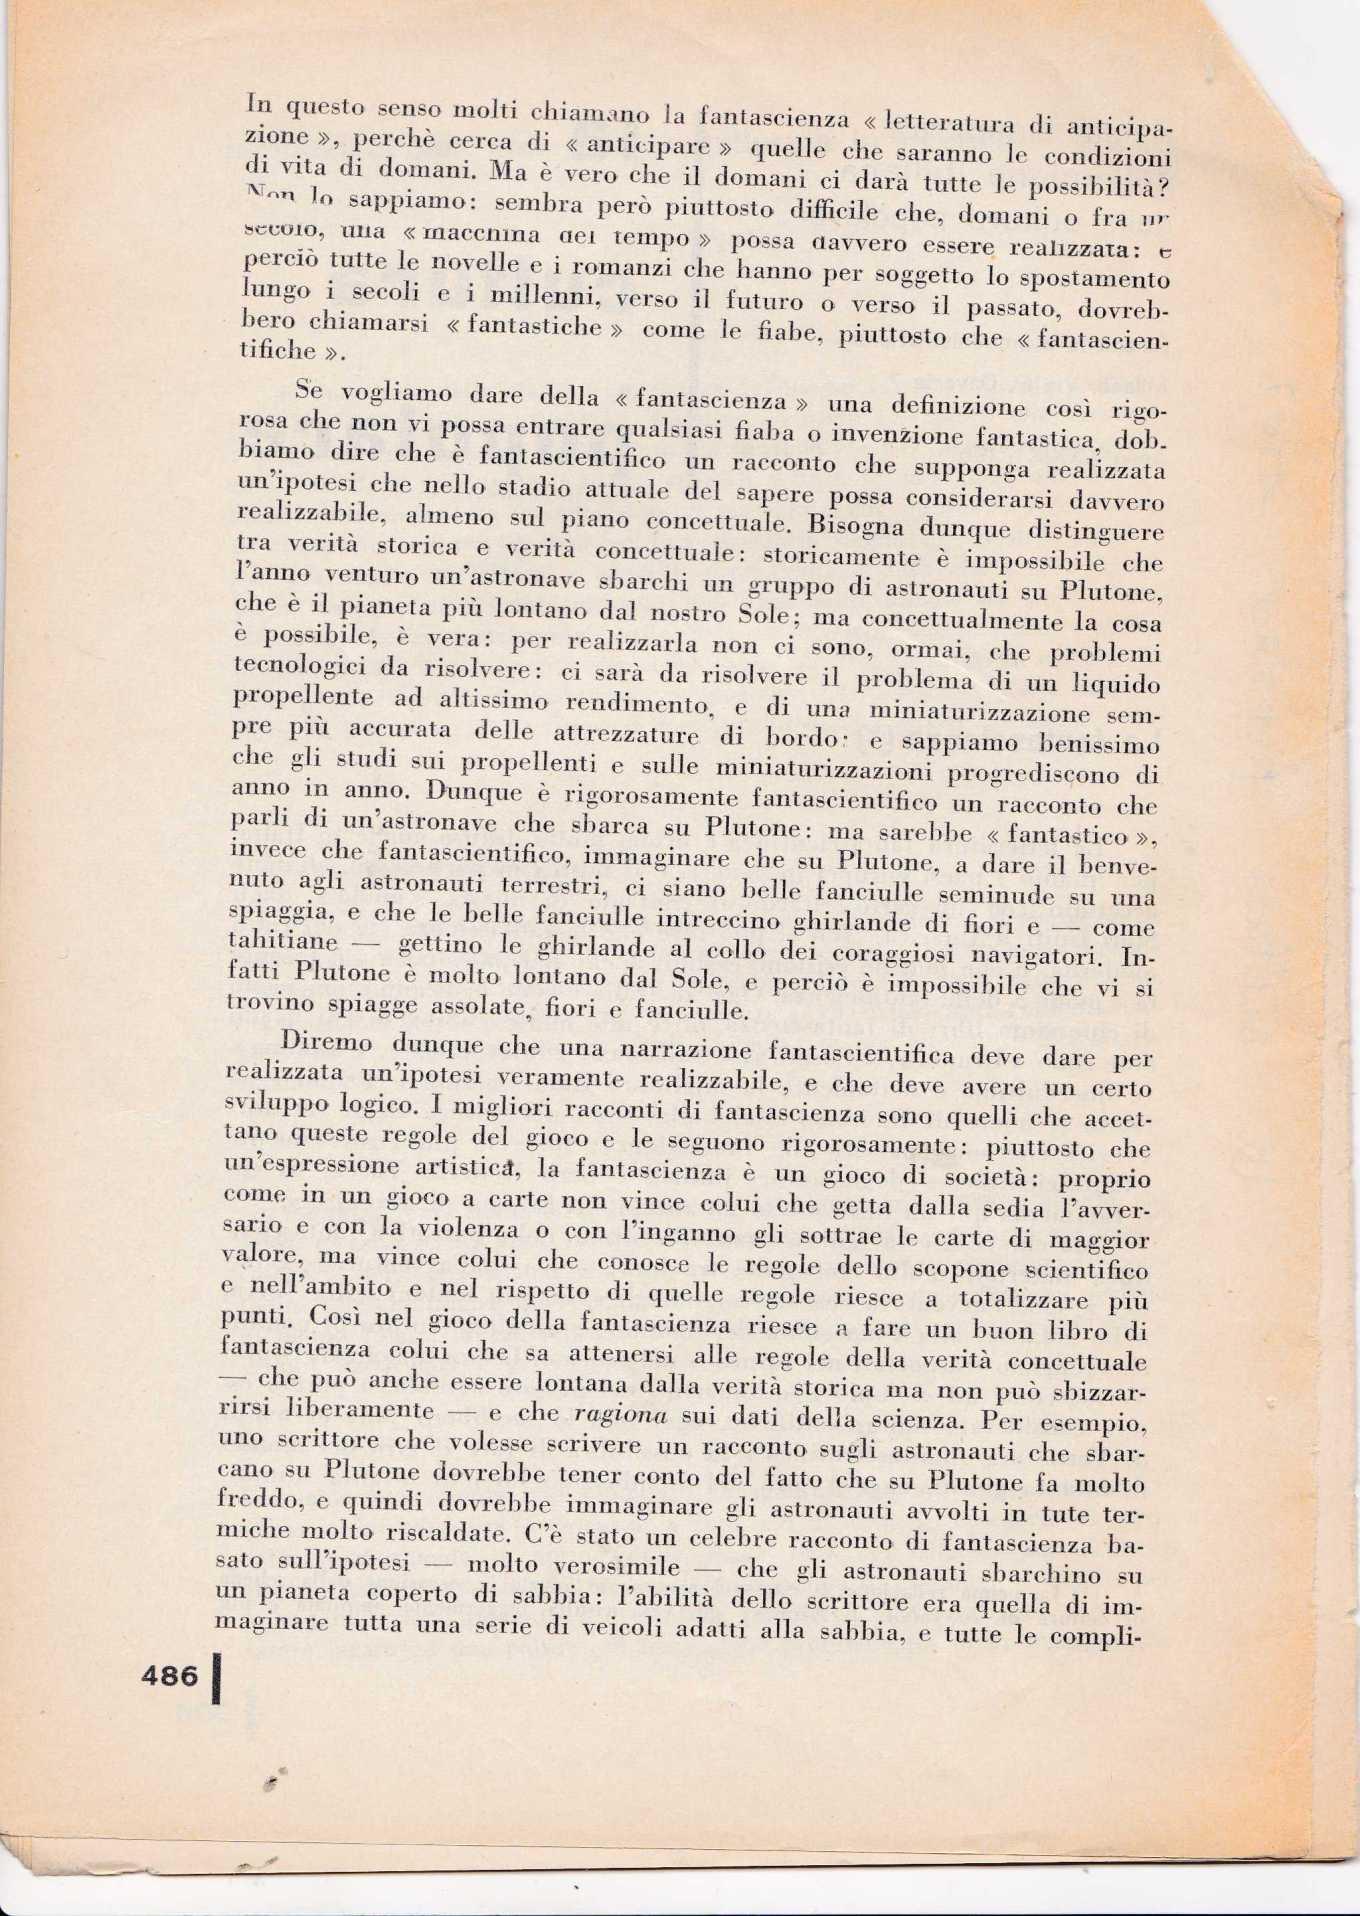 laura conti fantascienza 19673402